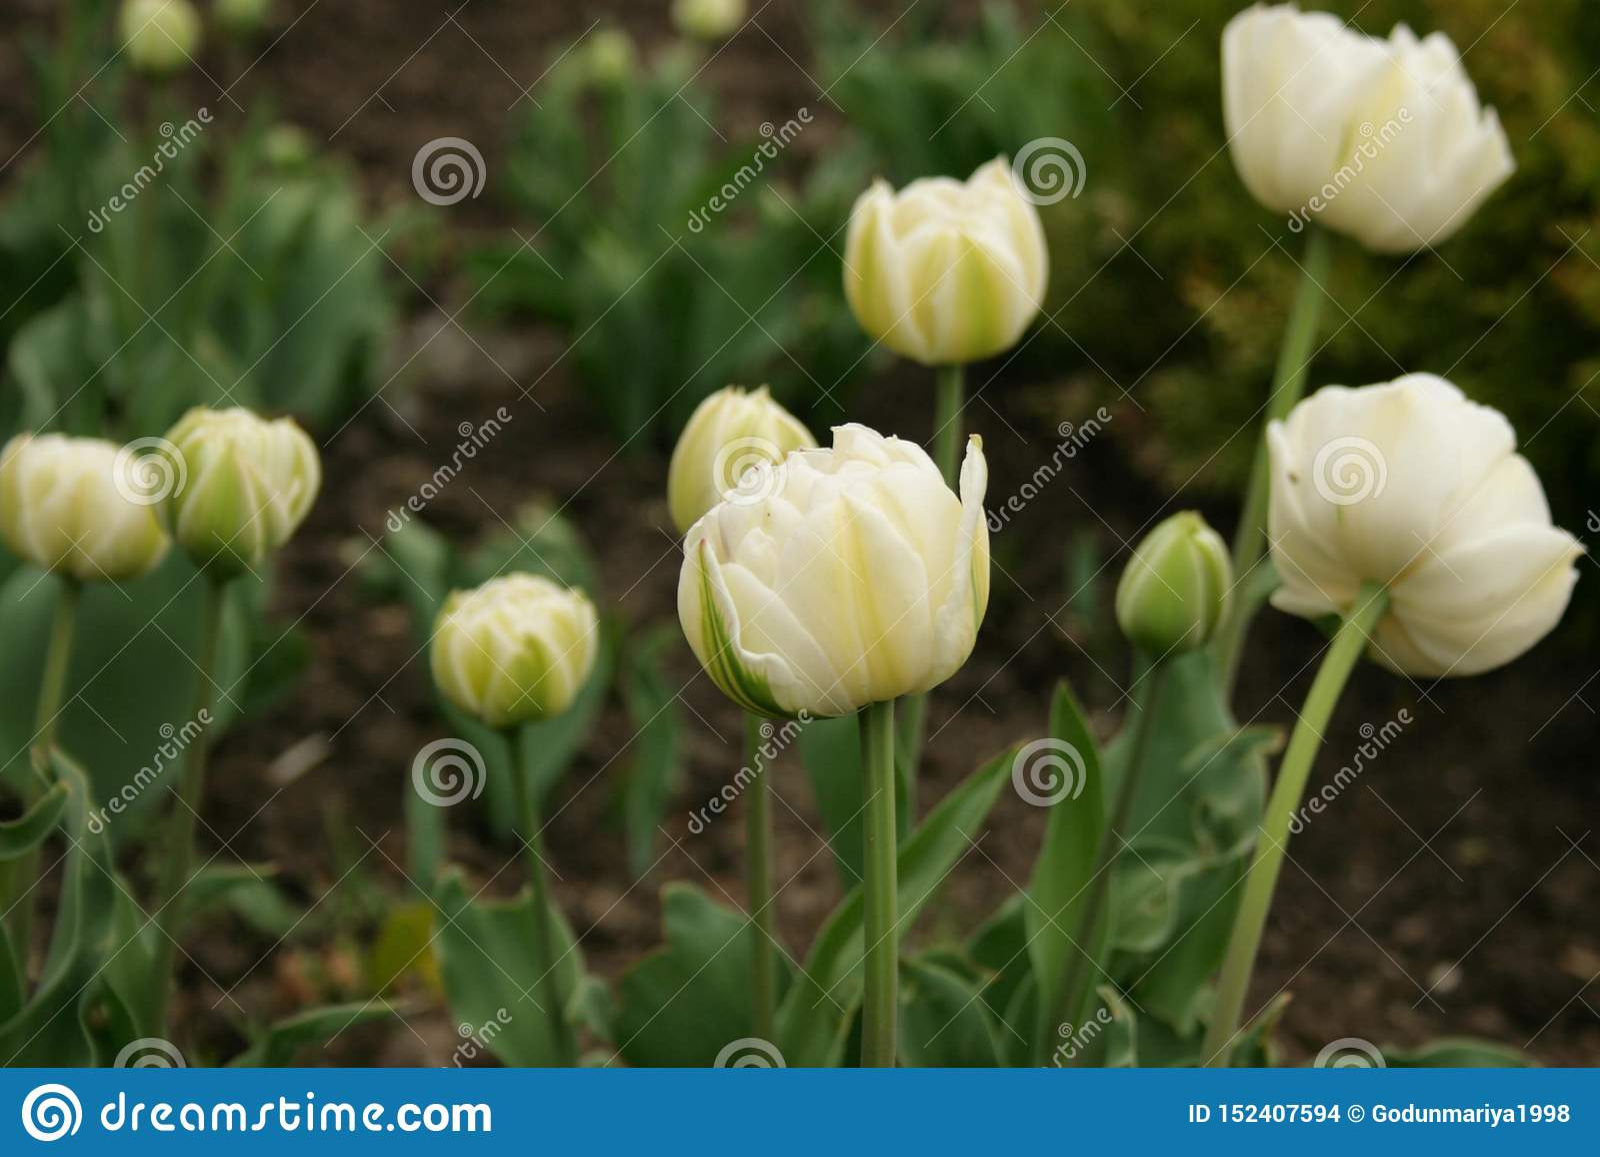 Flores da mola - tulips brancos